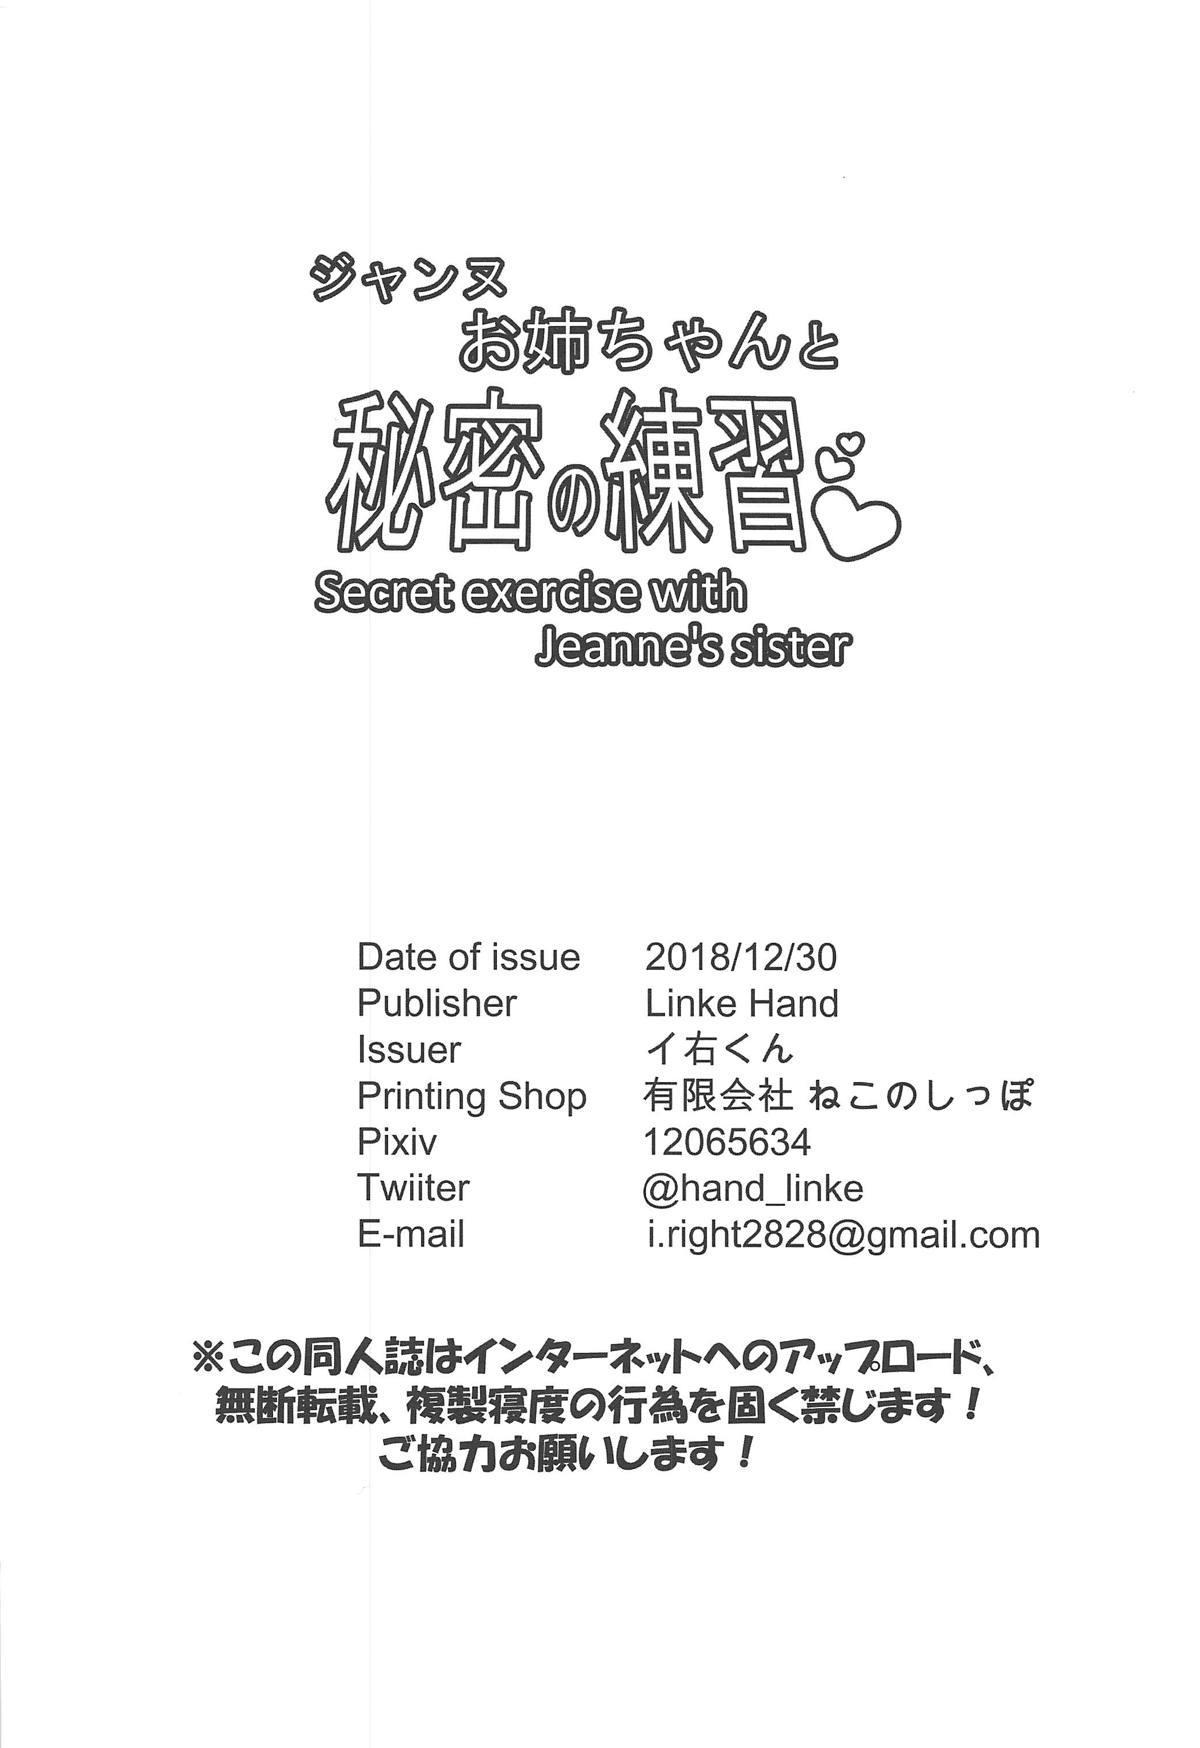 (C95) [Linke Hand (Iu-kun)] Jeanne Onee-chan to Himitsu no Renshuu - Secret excercise with Jeanne's sister (Fate/Grand Order) 22